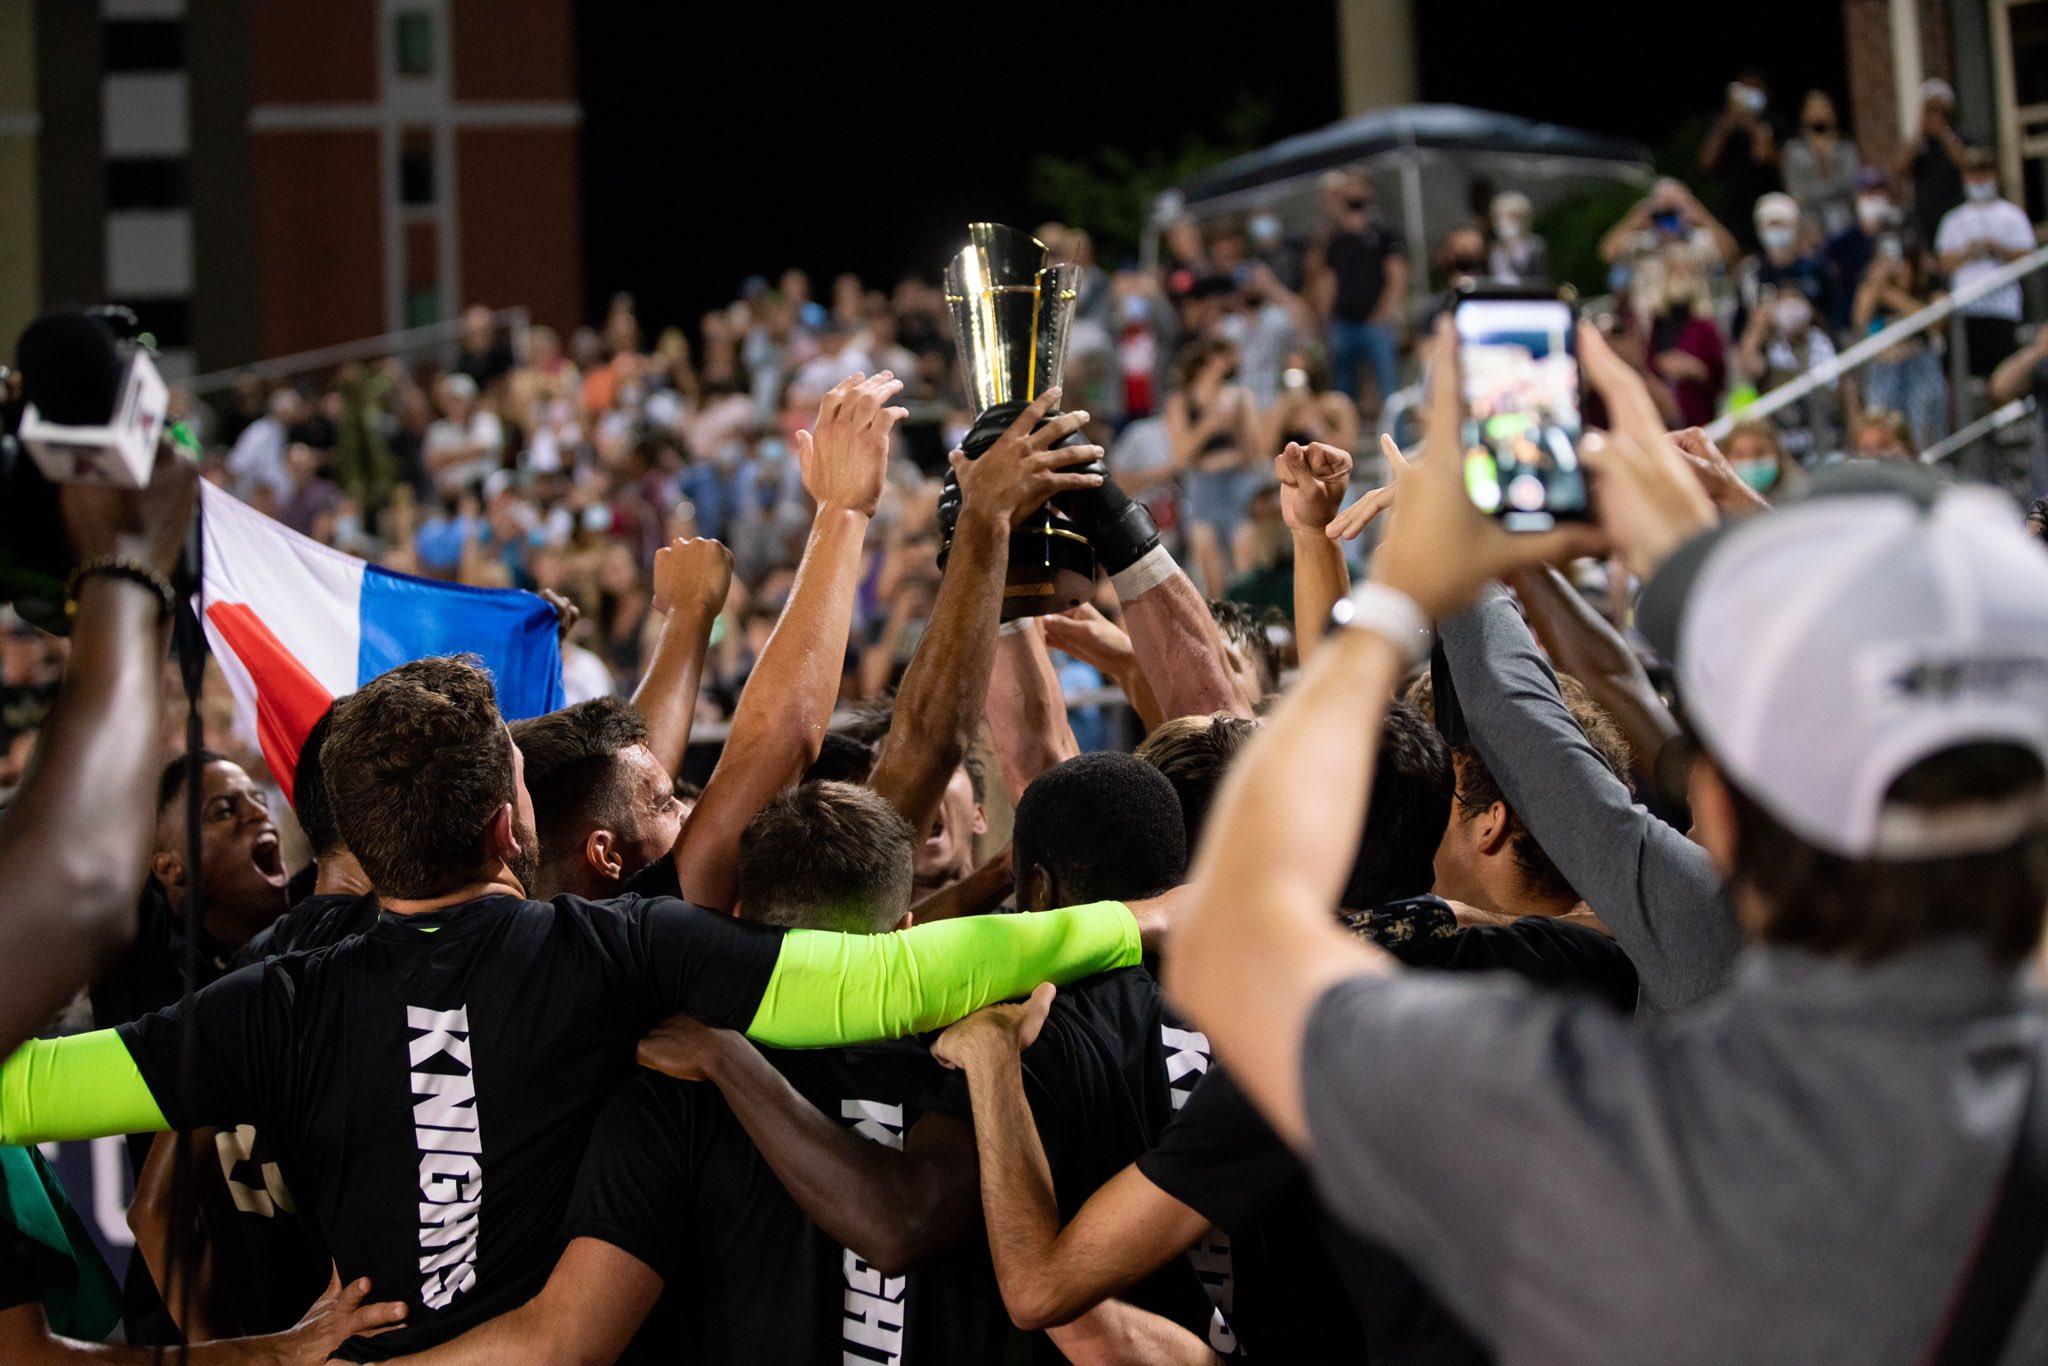 Men's Soccer Trophy